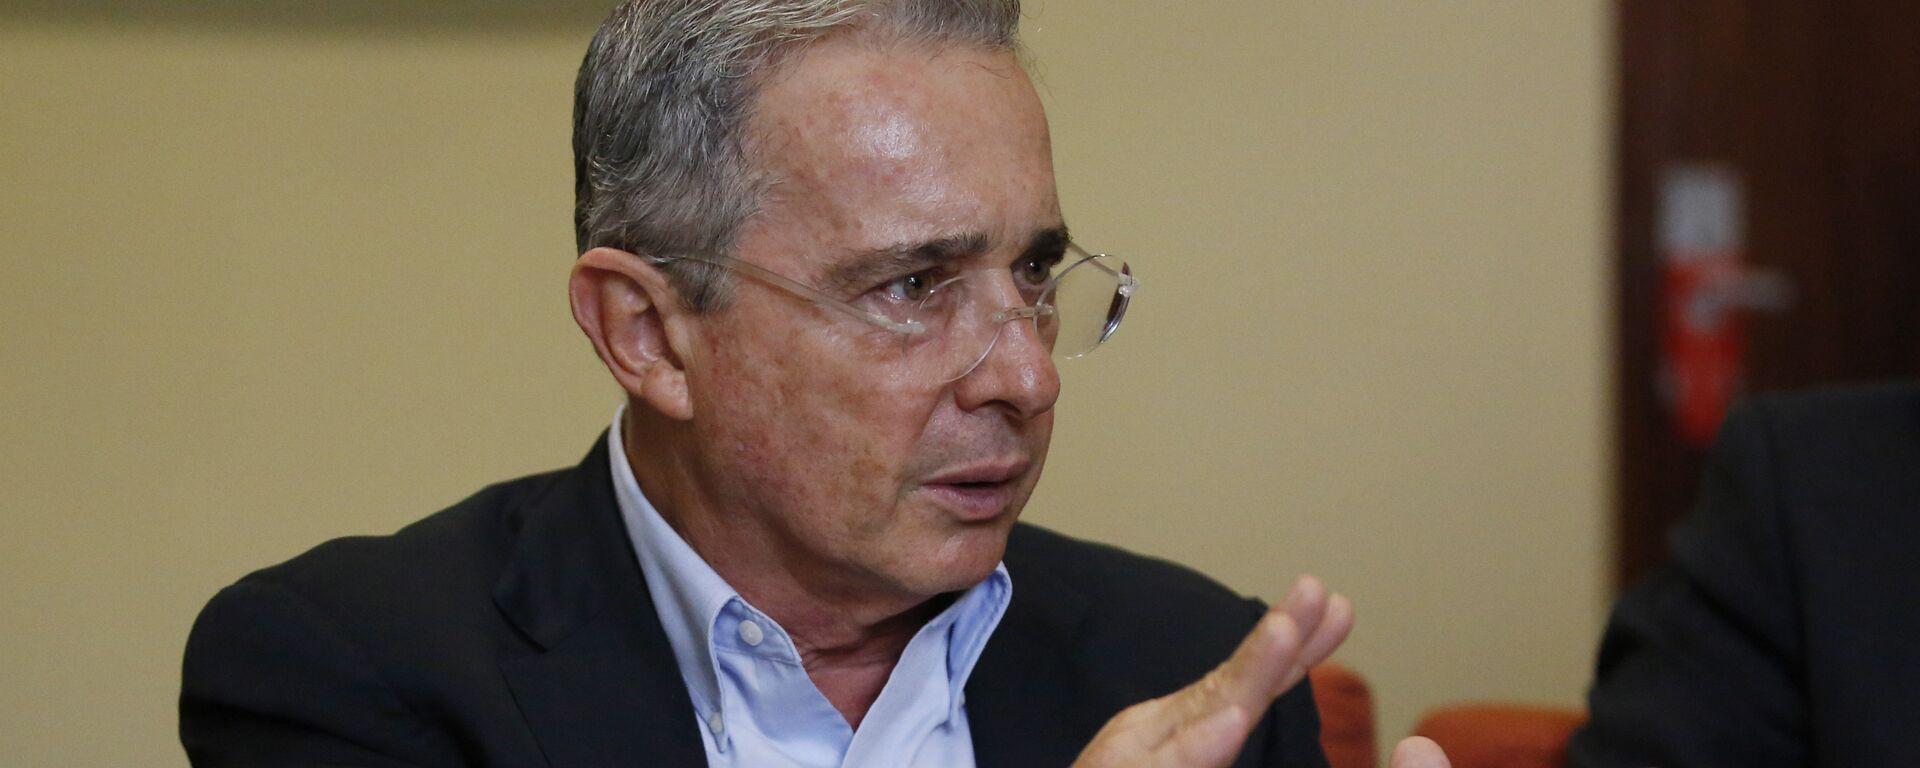 Álvaro Uribe Vélez, expresidente de Colombia - Sputnik Mundo, 1920, 05.05.2021